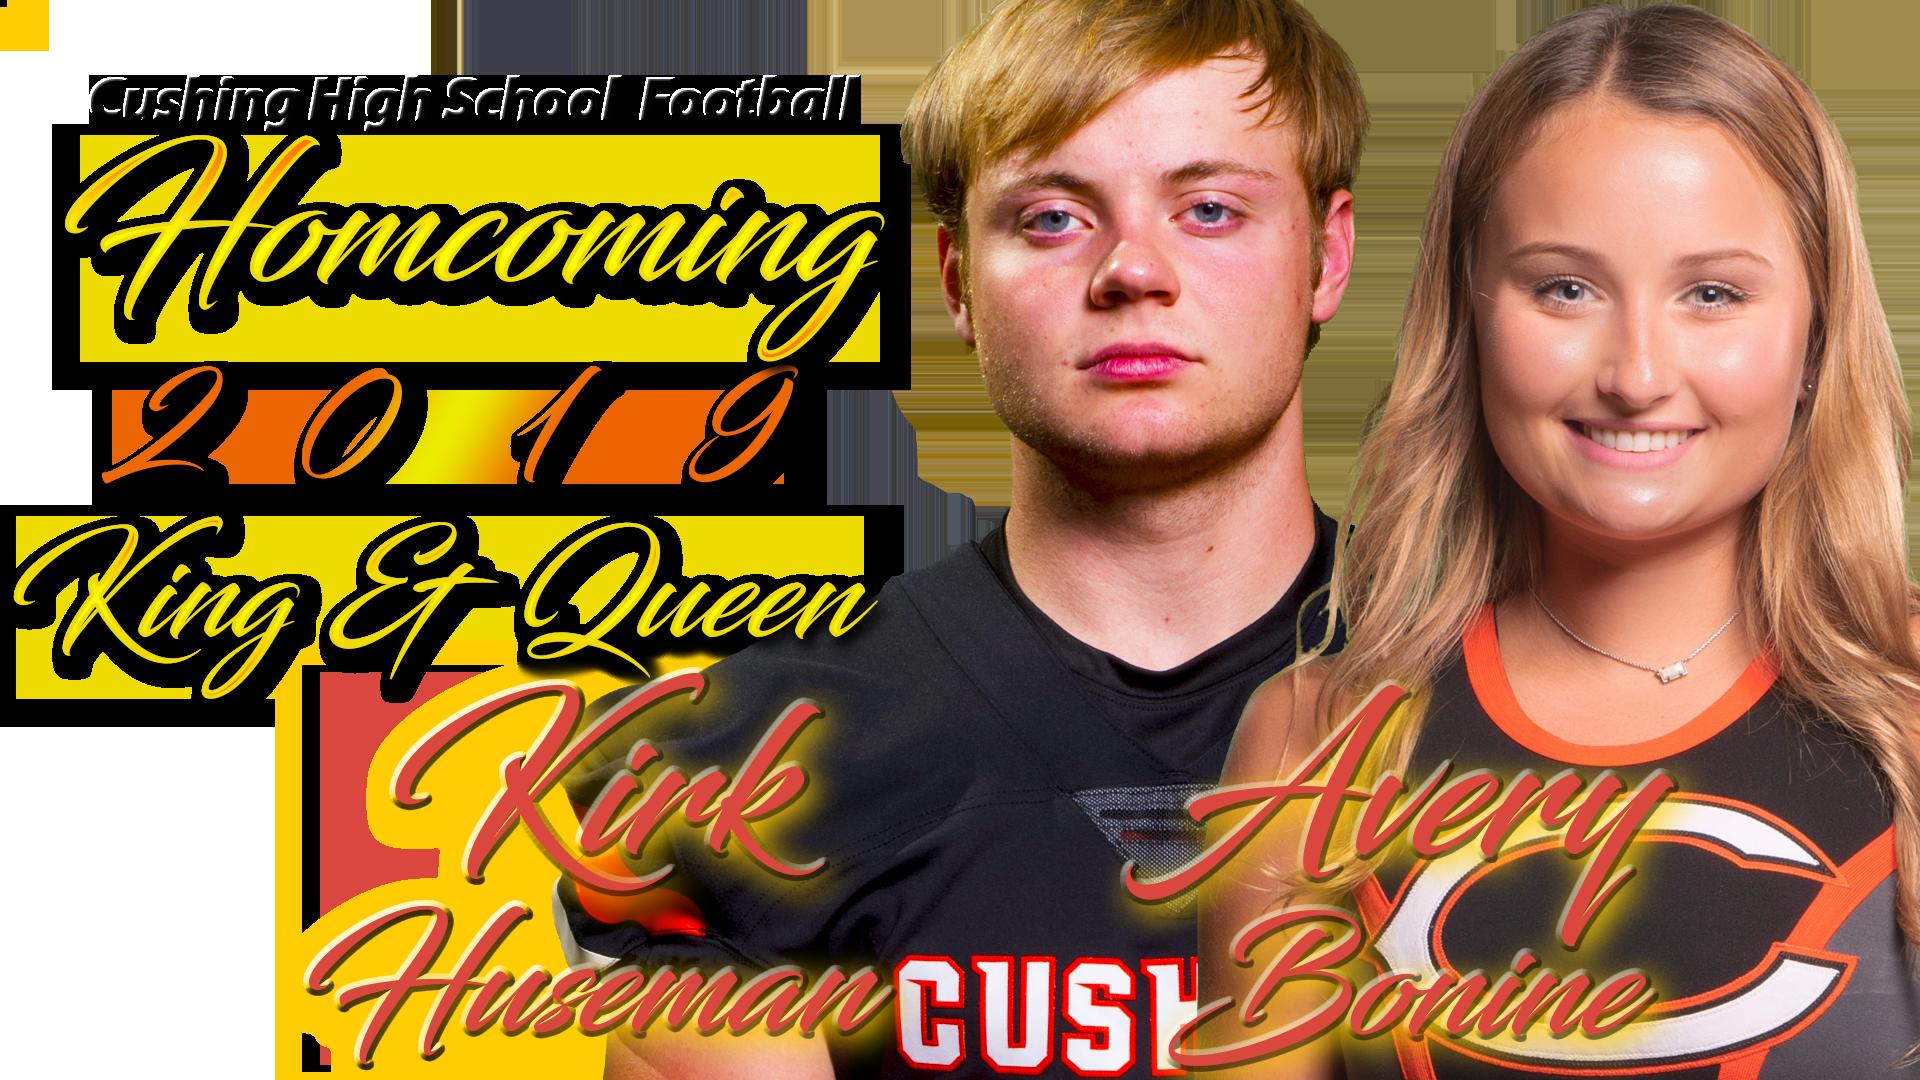 Cushing High School Home comng 2019 King & Queen.